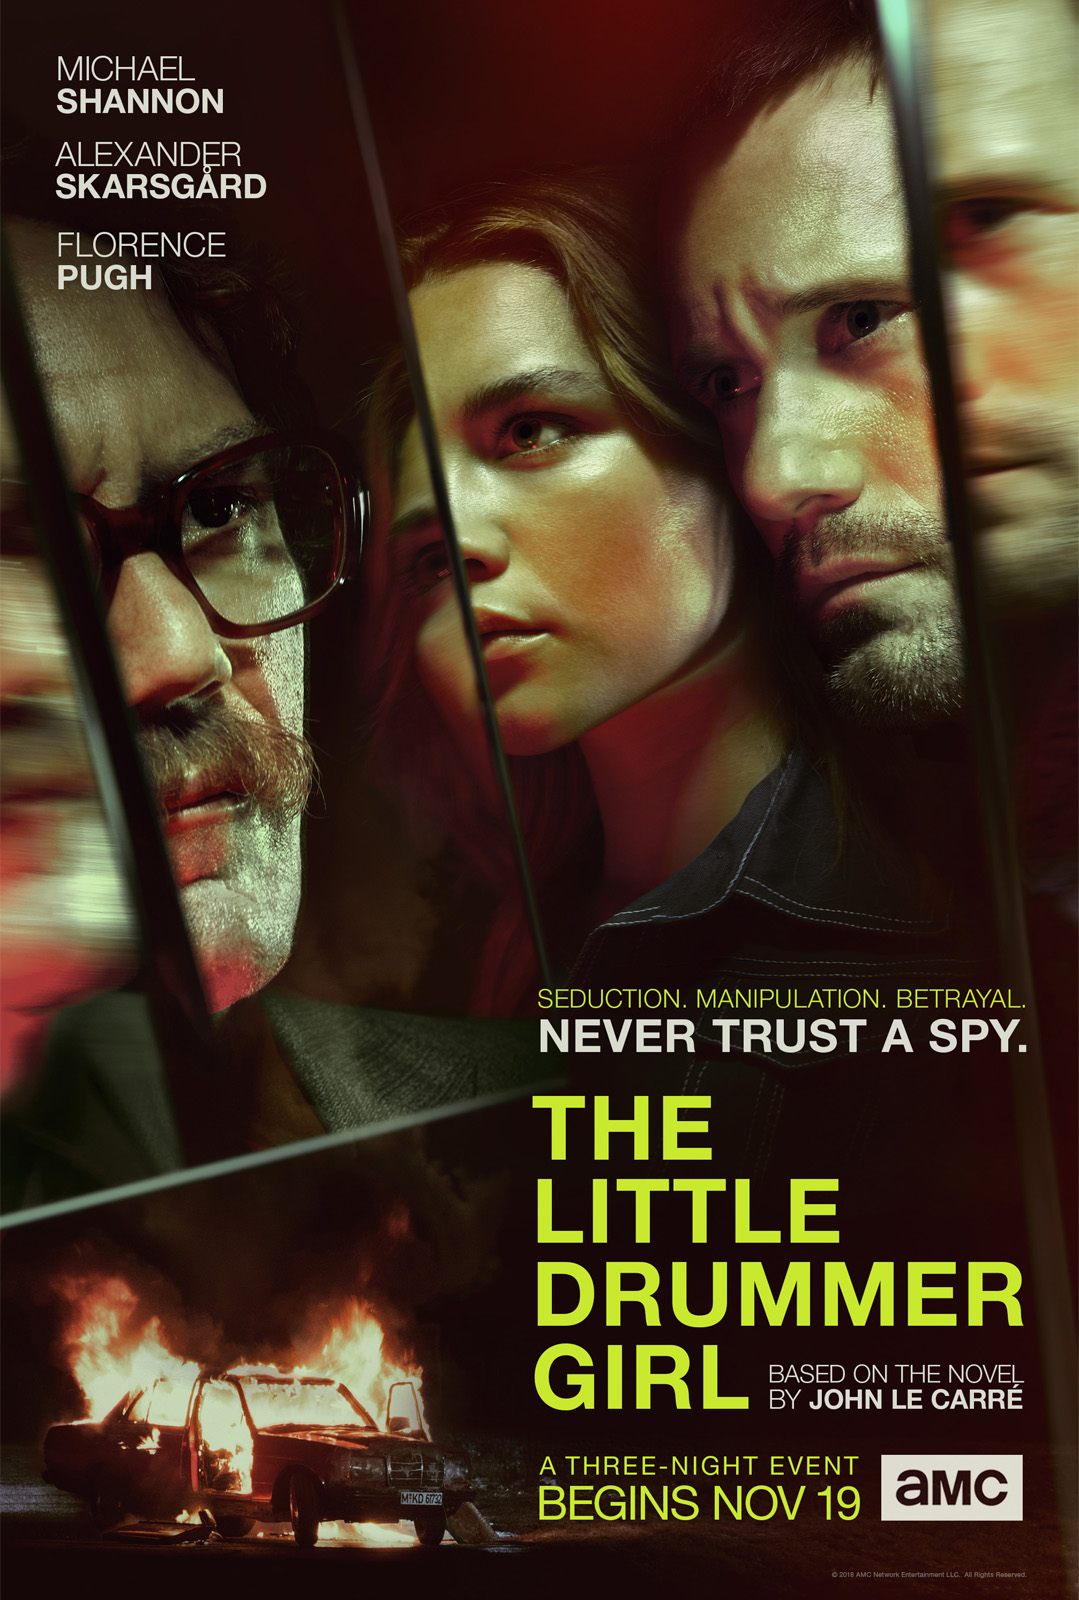 The Little Drummer Girl S01 E04 VOSTFR